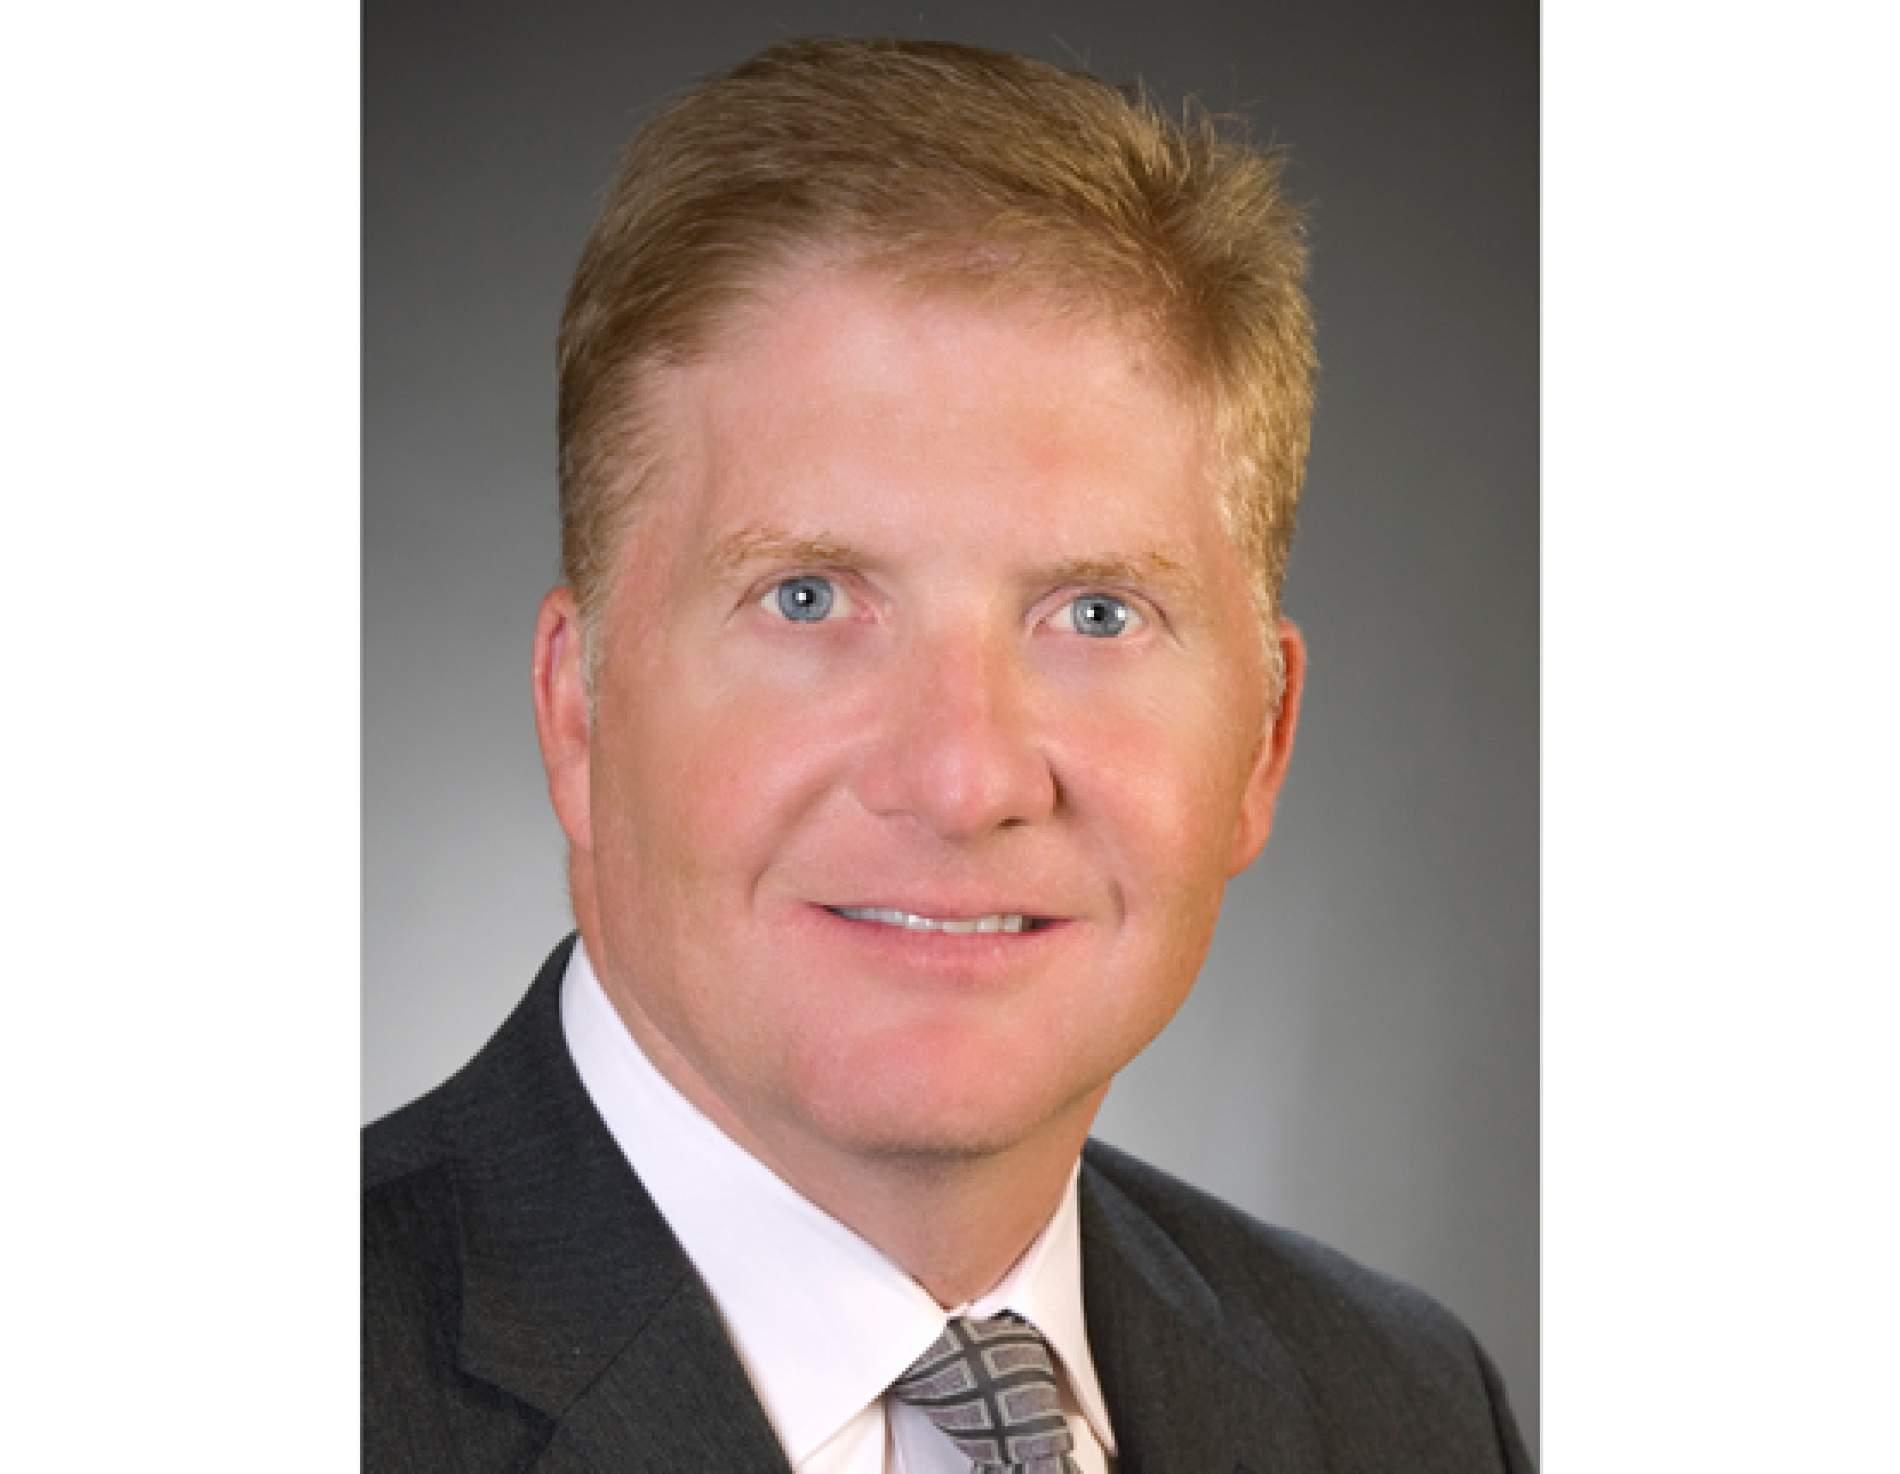 David C. Jacobs